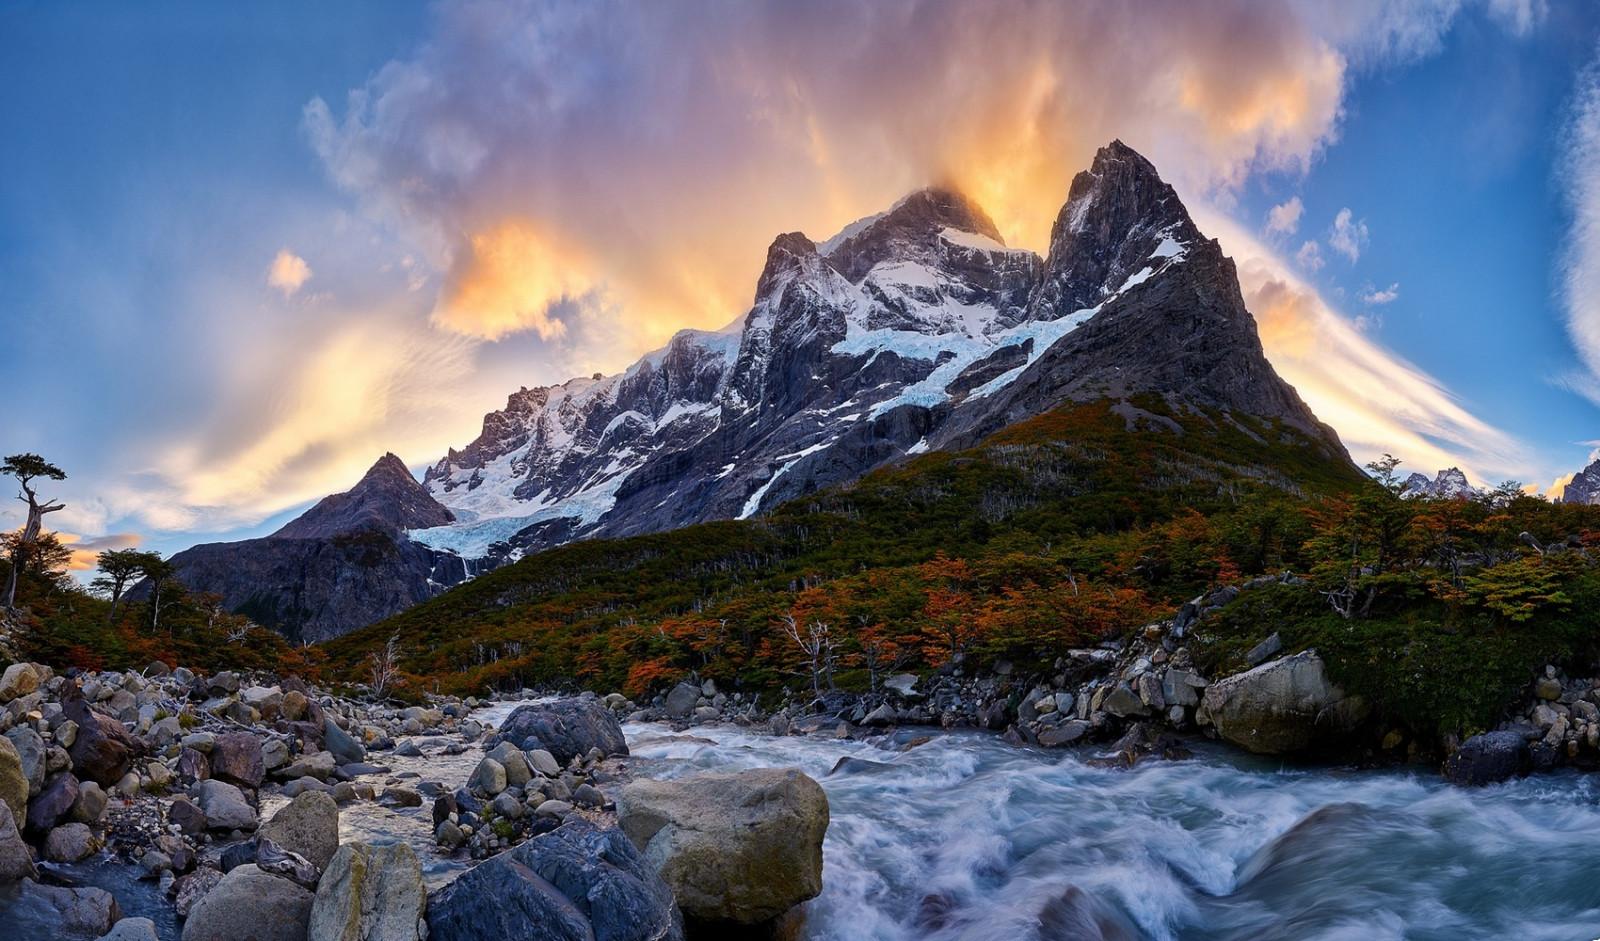 Fondo De Pantalla Paisaje Montañas Nevada: Fondos De Pantalla : Paisaje, Bosque, Montañas, Rock